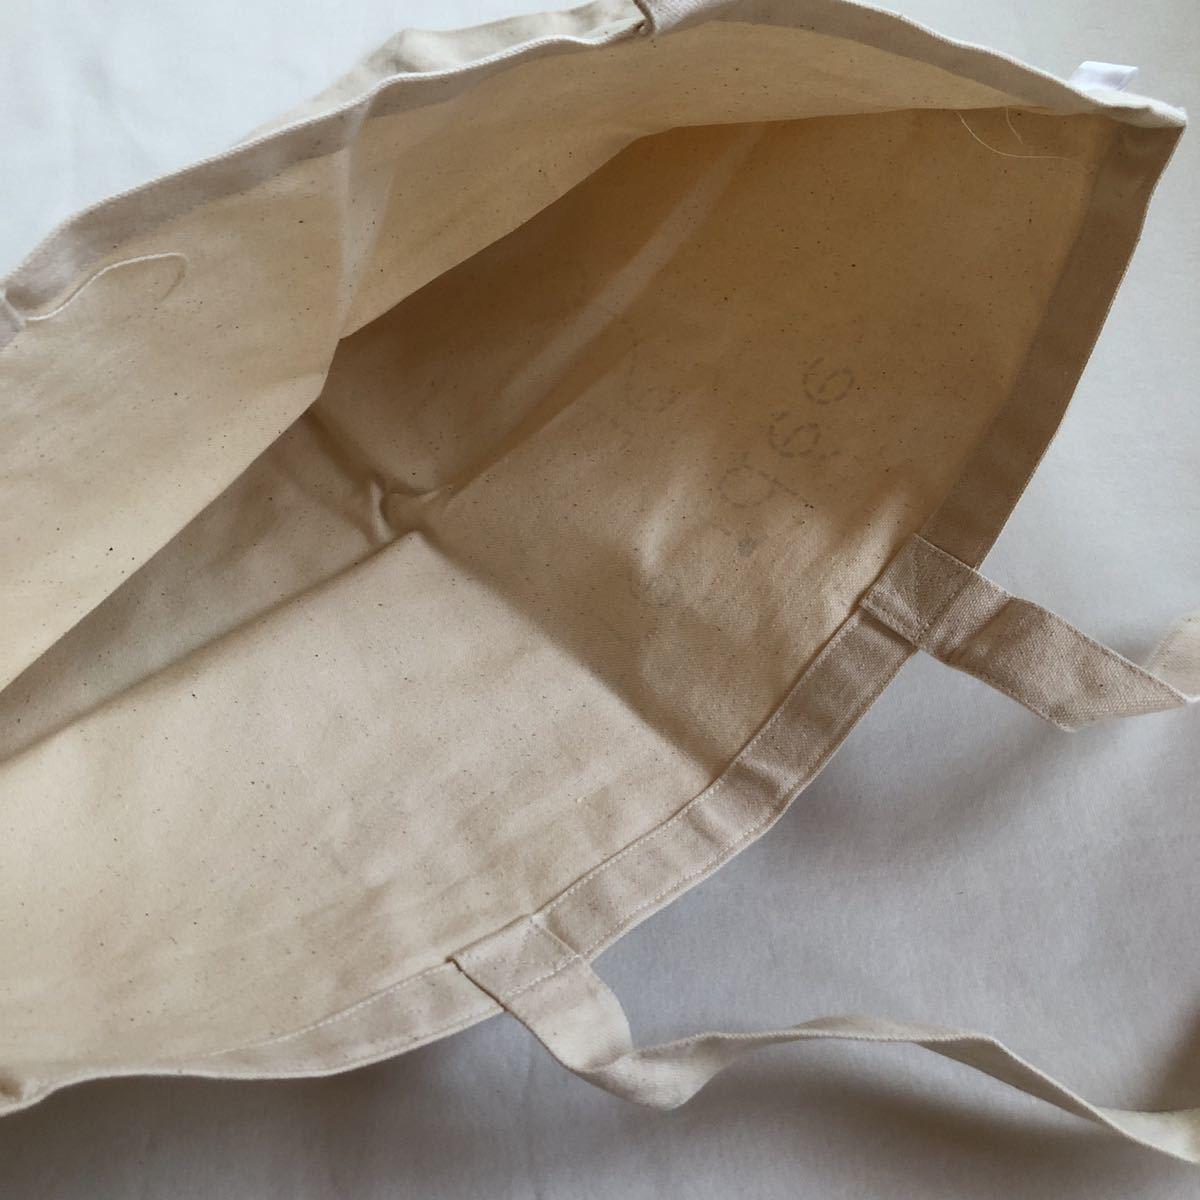 Une autre idee du fromage 鞄 かばん カバン コットンバック トートバッグ 非売品 新品 ノベルティグッズ エコバッグ_画像5